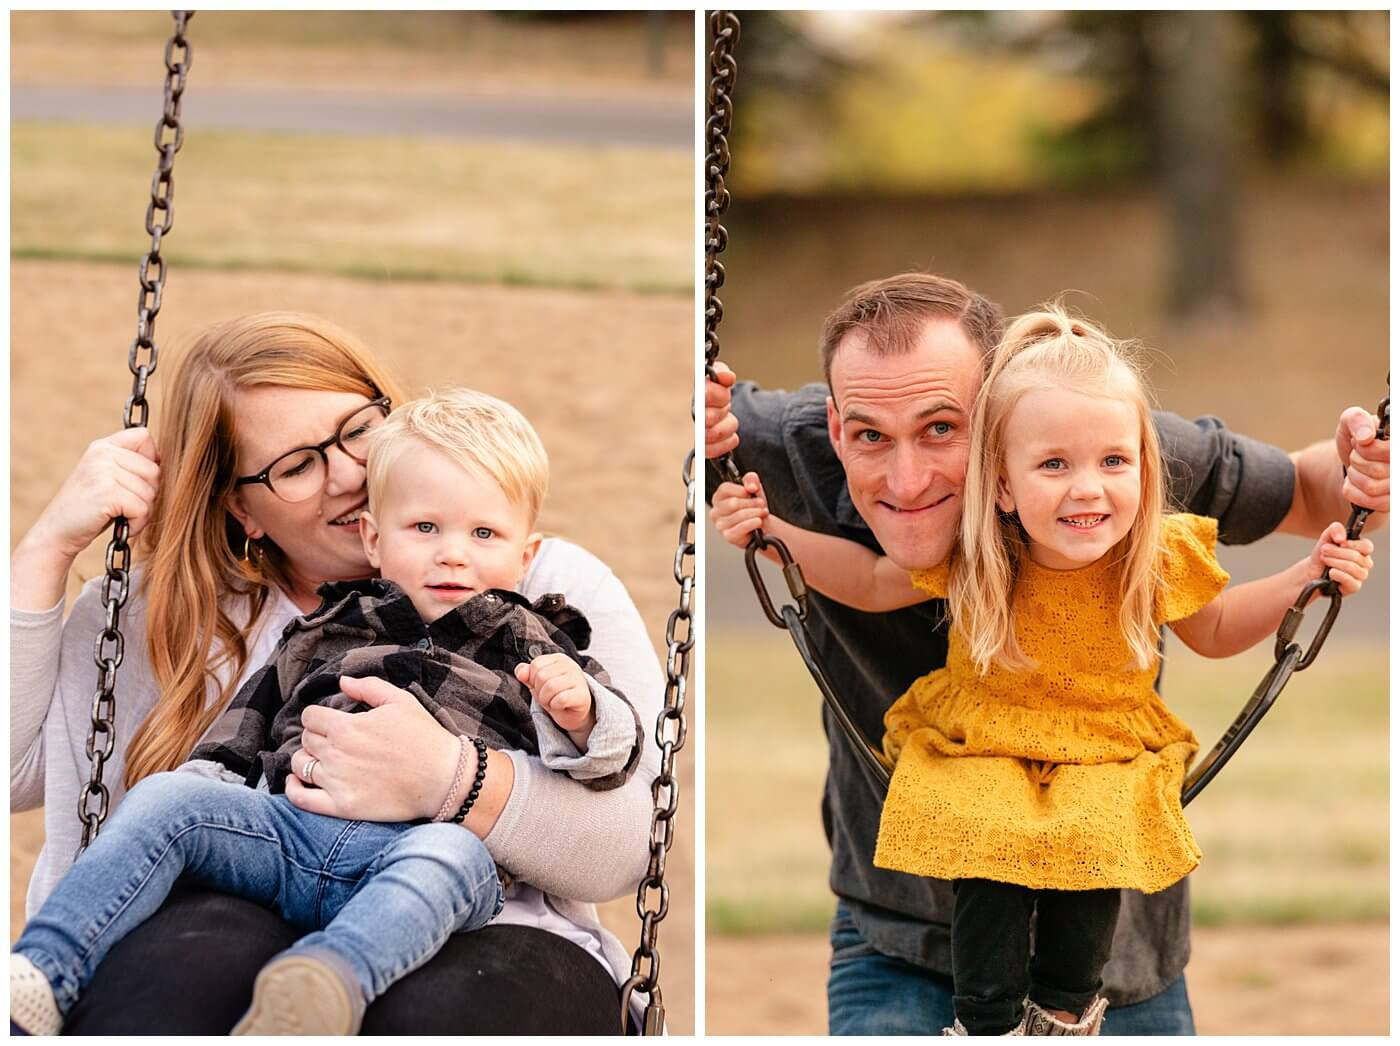 Liske Family 2020 - Science Centre - 007 - Kids on Swings